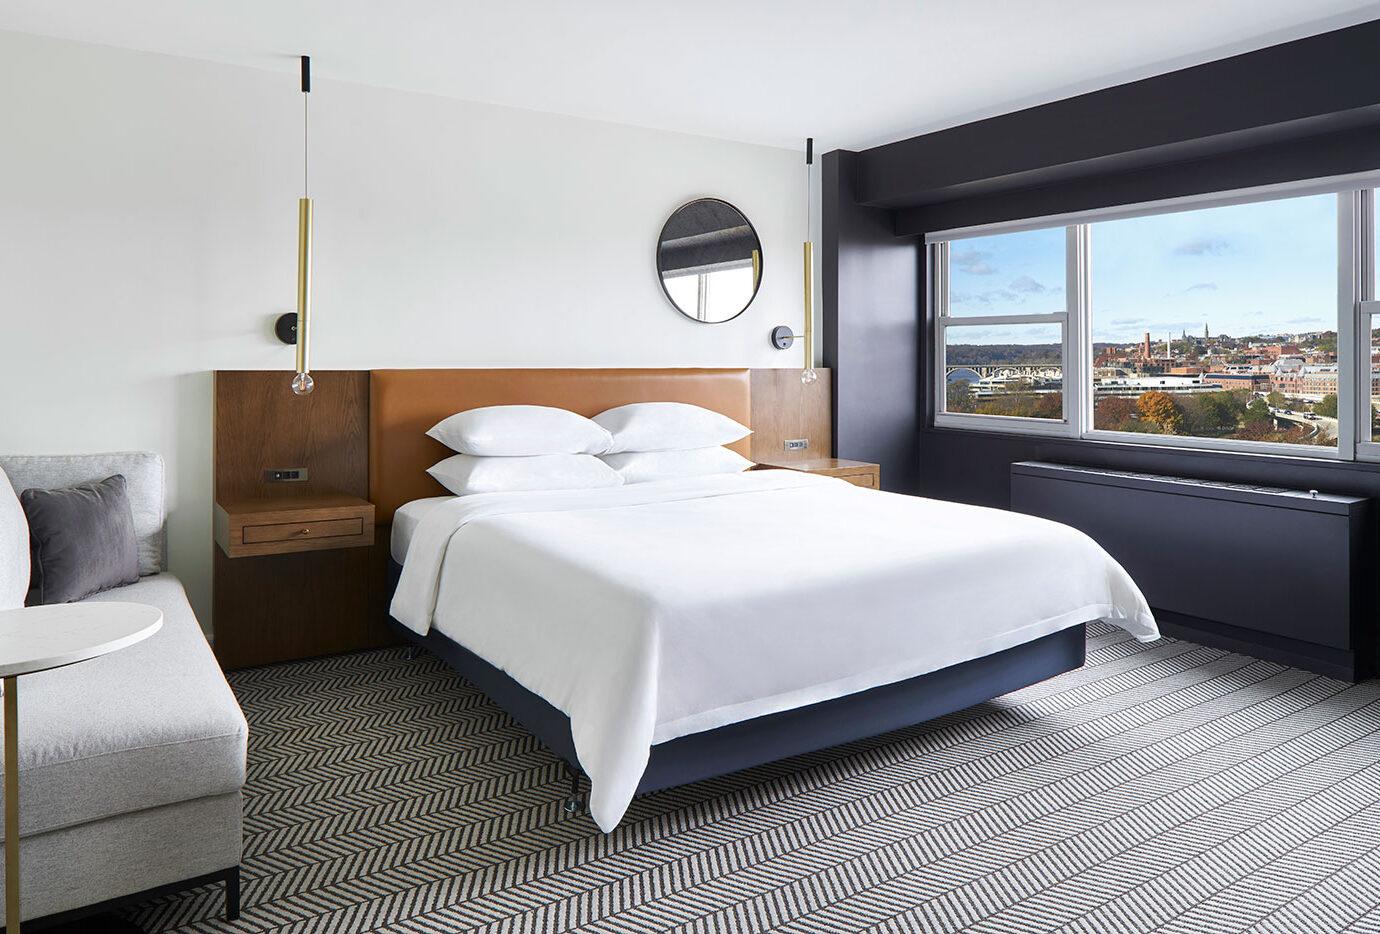 Bedroom at ARC THE.HOTEL, Washington D.C.